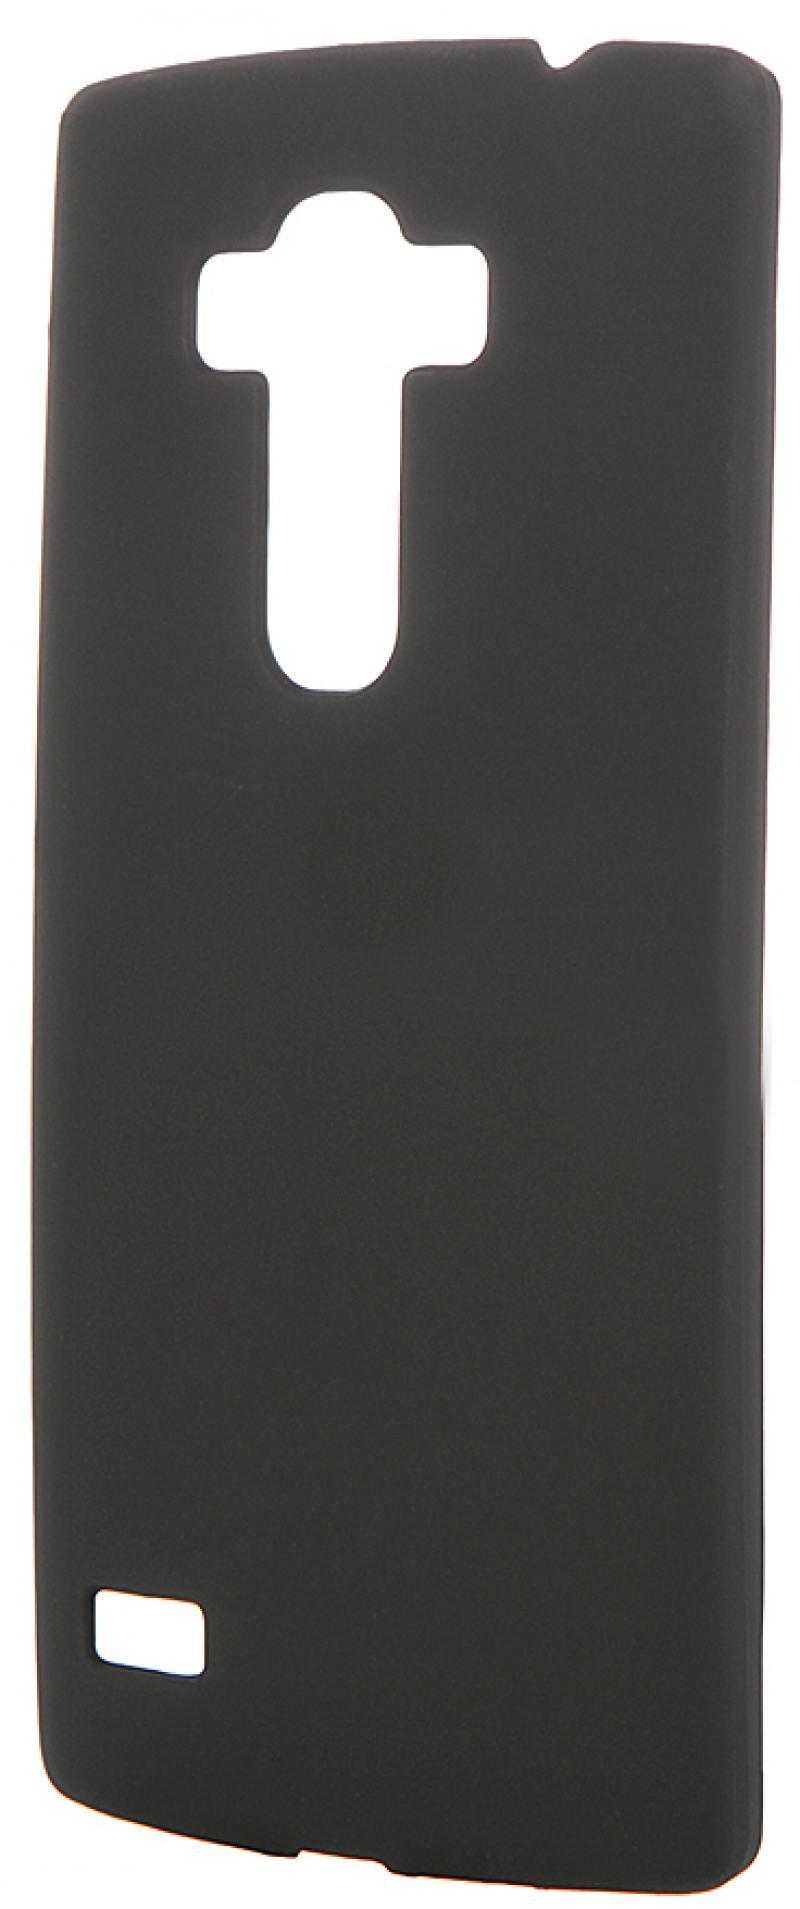 Чехол-накладка для LG G4S Pulsar CLIPCASE PC Soft-Touch Black клип-кейс, пластик клип кейс lg cch 210 для l5 ii черный